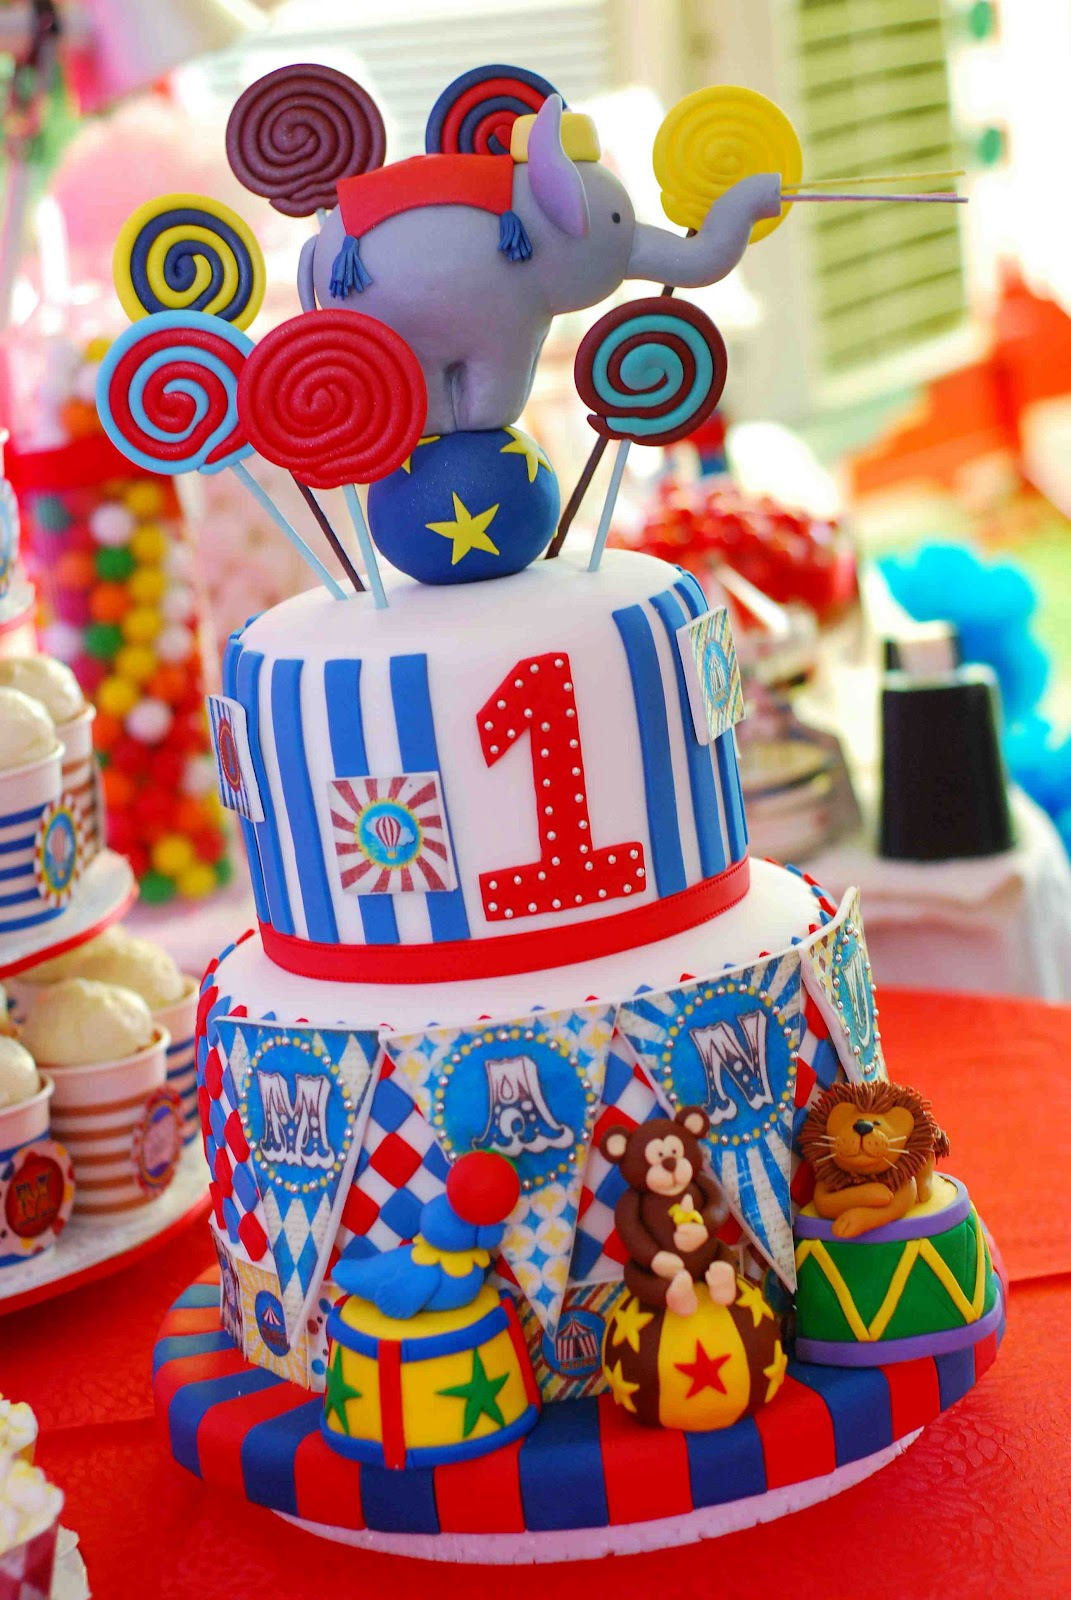 j a j a r a m a Manus 1st Birthday Carnival